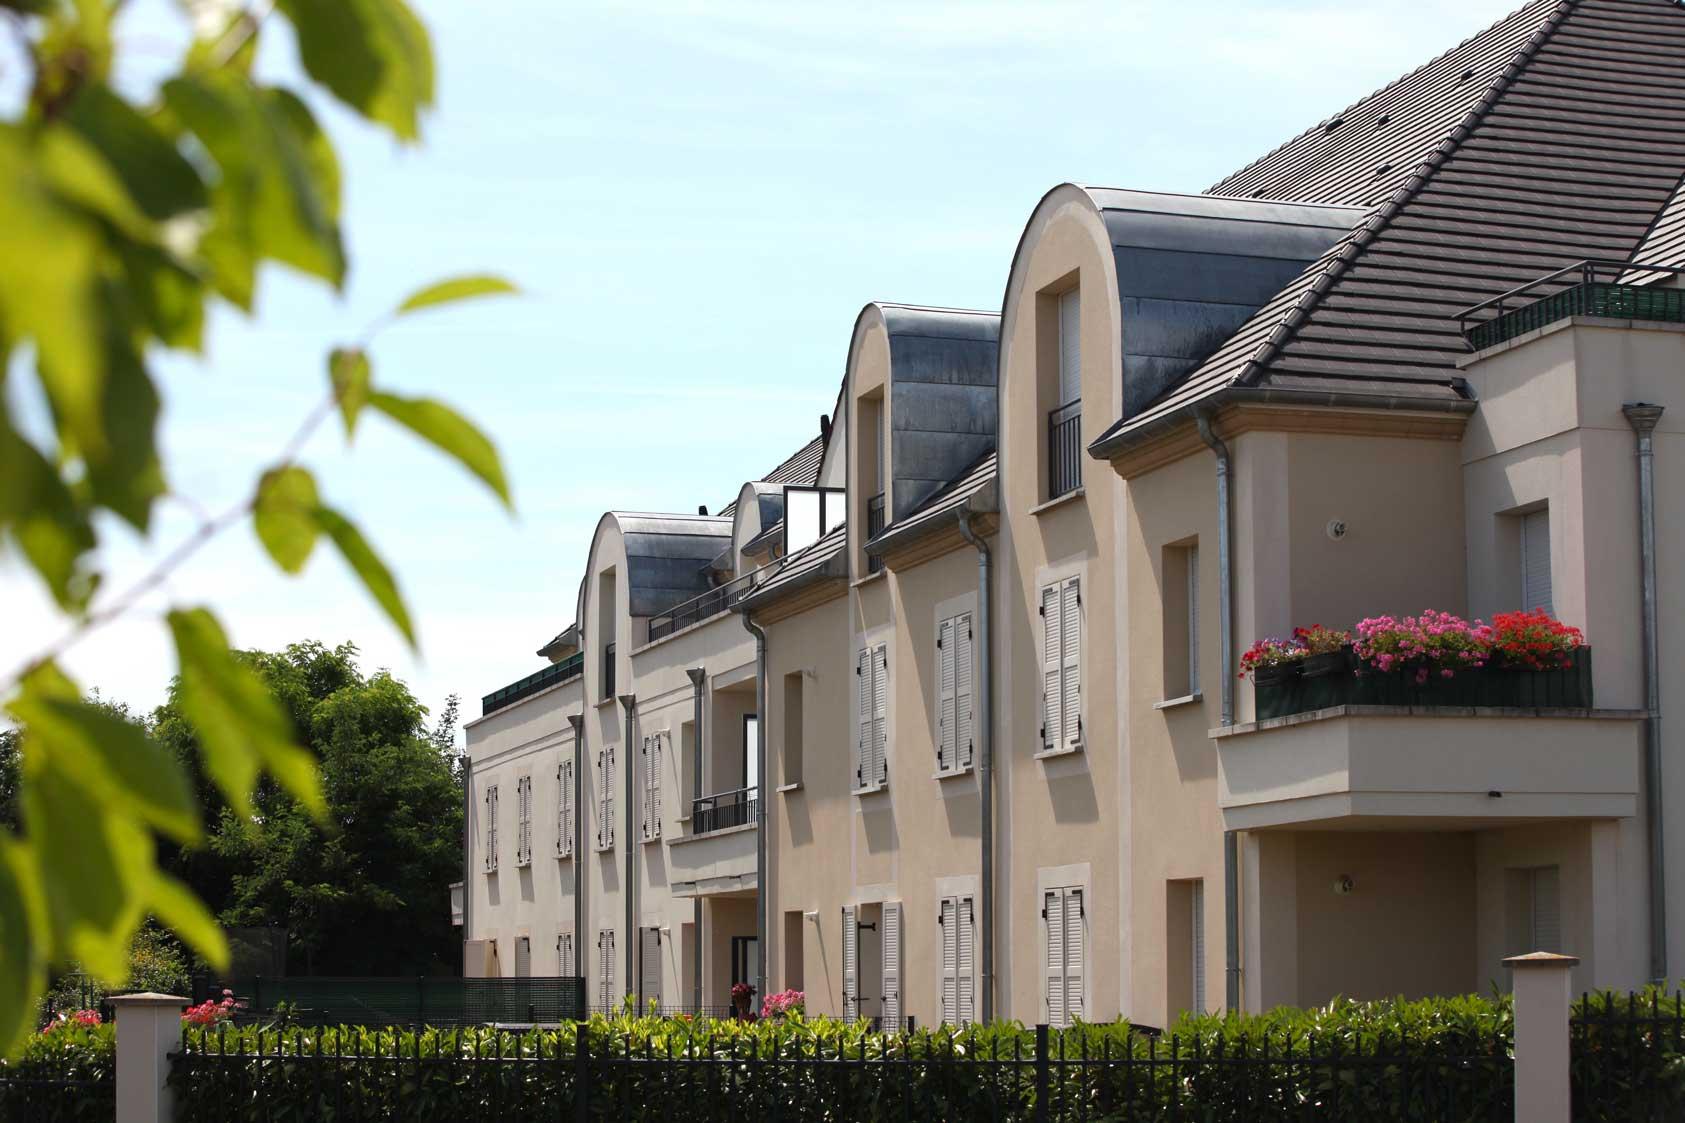 Residence_Clos_Saint_Louis_8